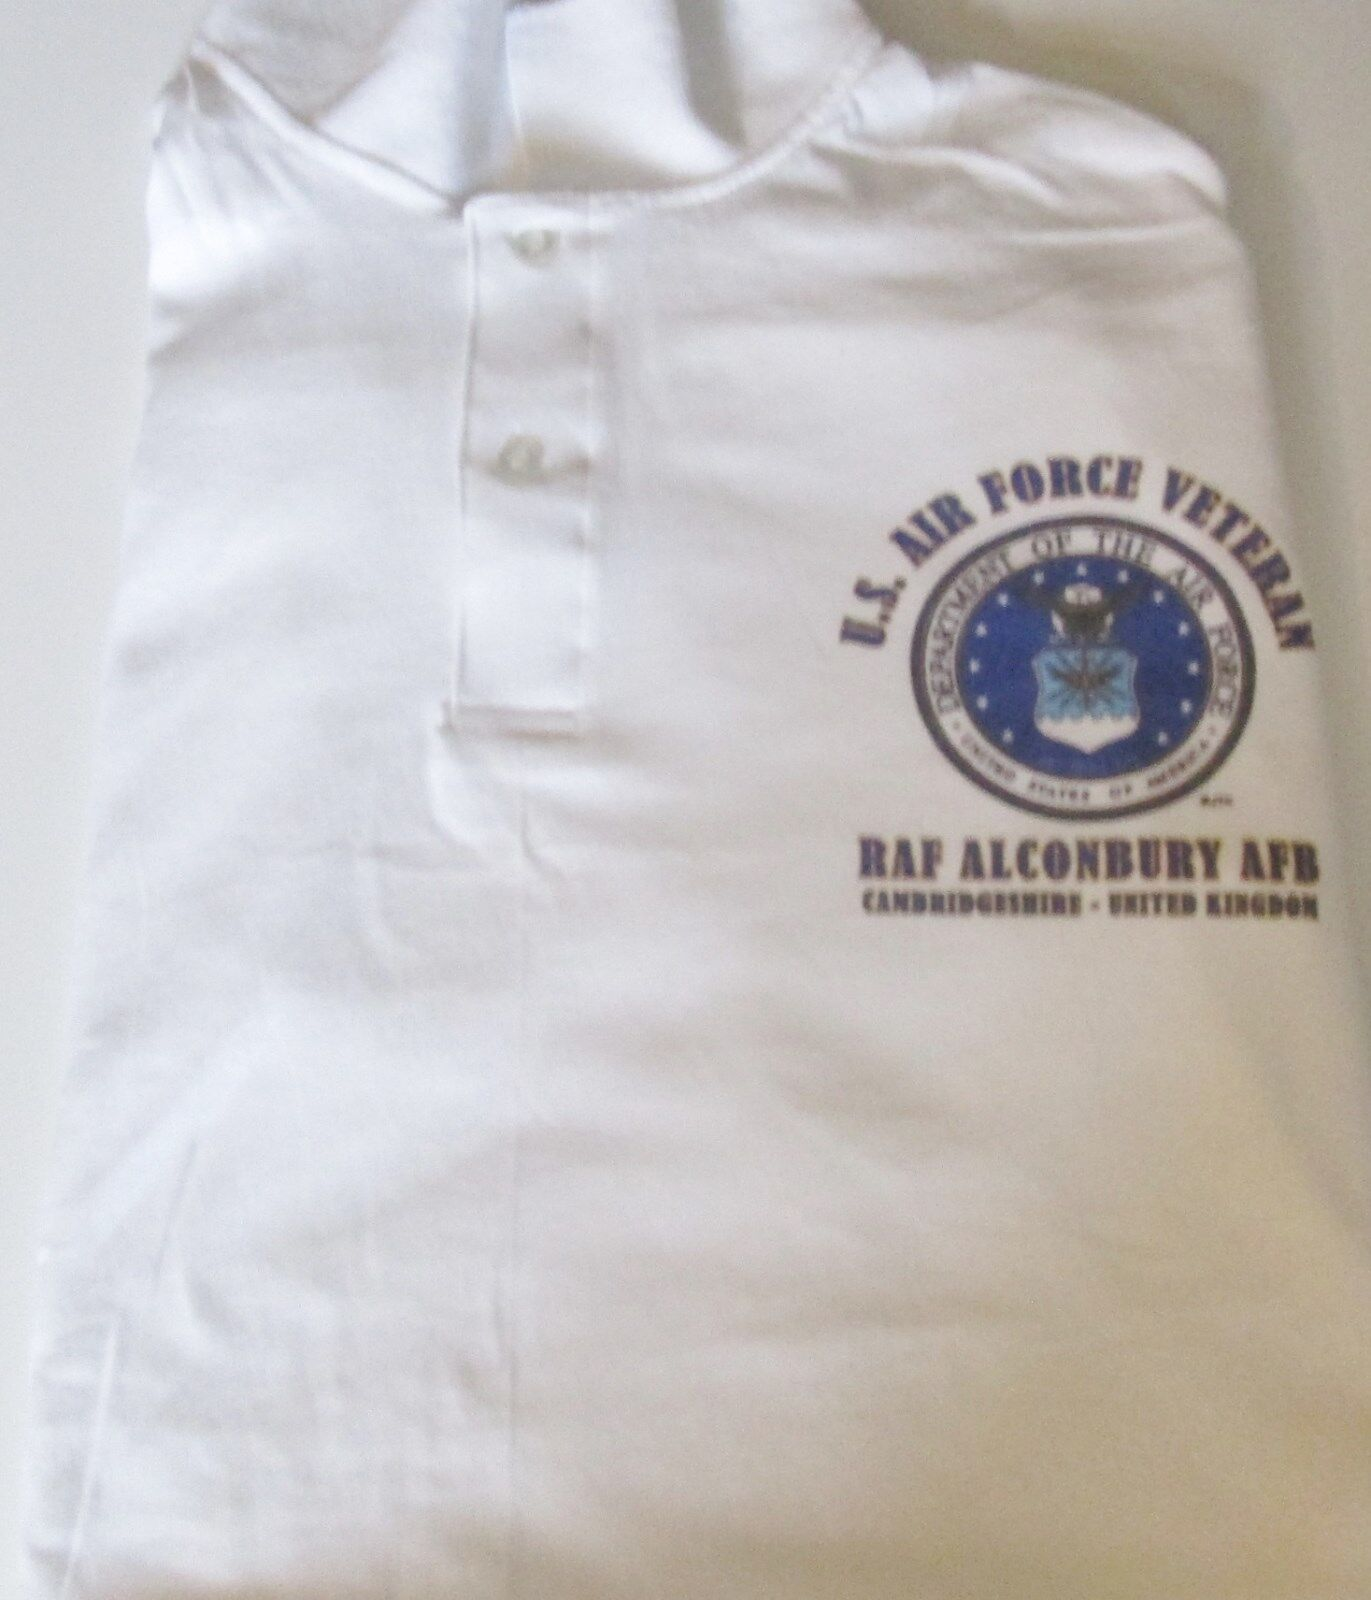 RAF ALCONBURY AFBCAMBRIDGESHIRE-UNITED KINGDOMAIR FORCE LIGHTWEIGHT POLO SHIRT